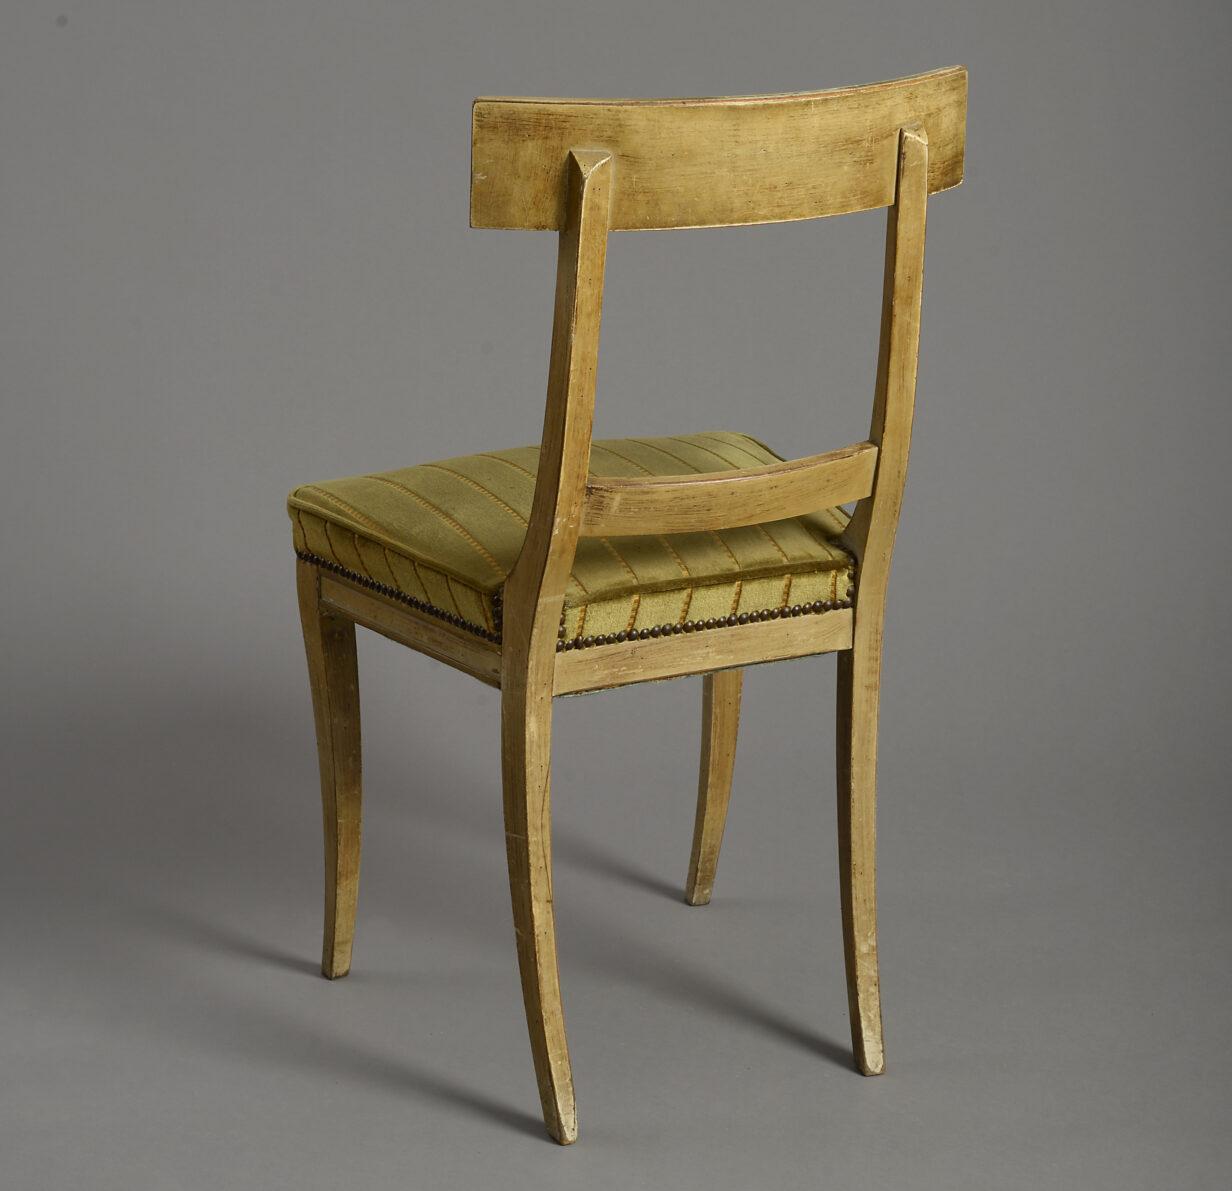 Pair of Painted Klismos Chairs